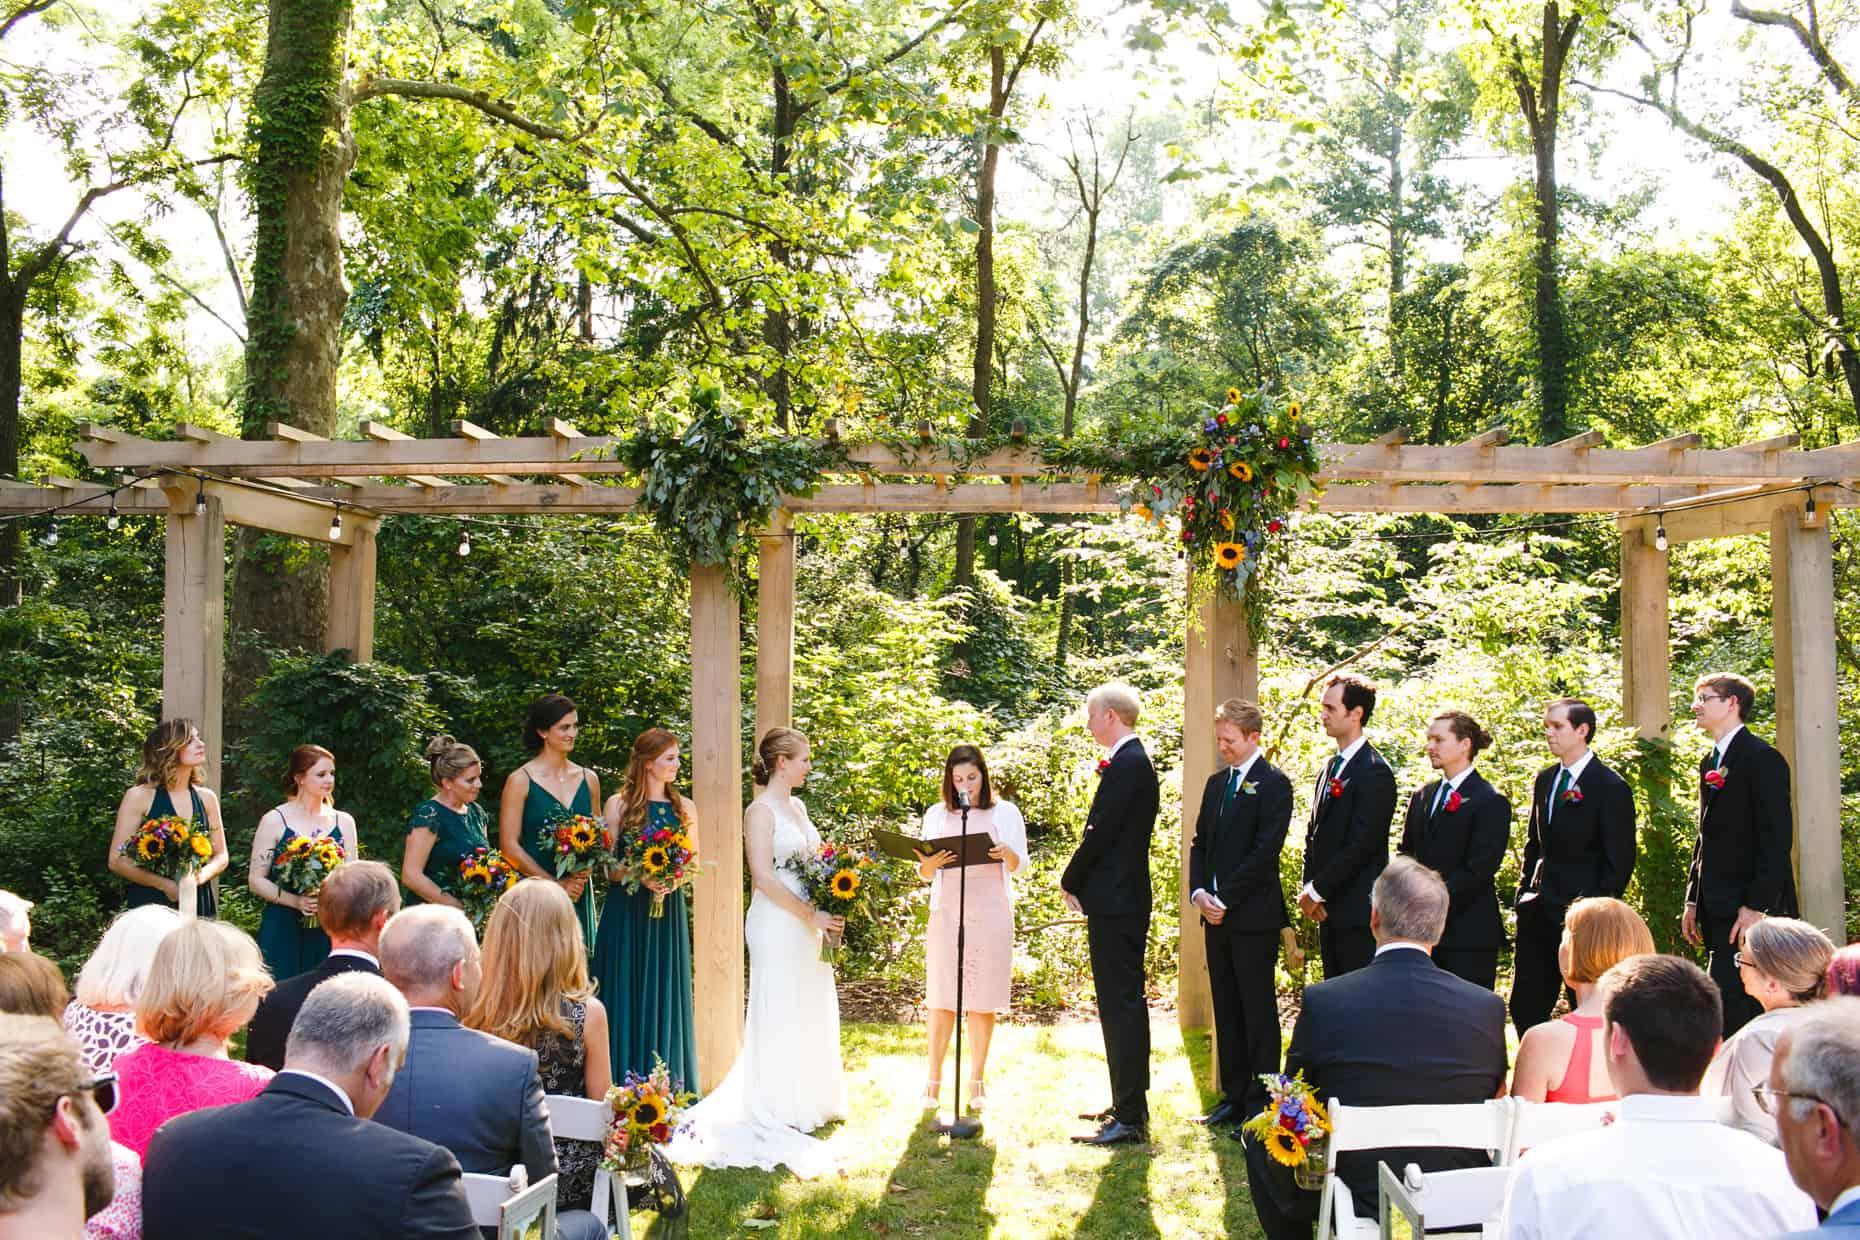 Chester County Wedding Reception